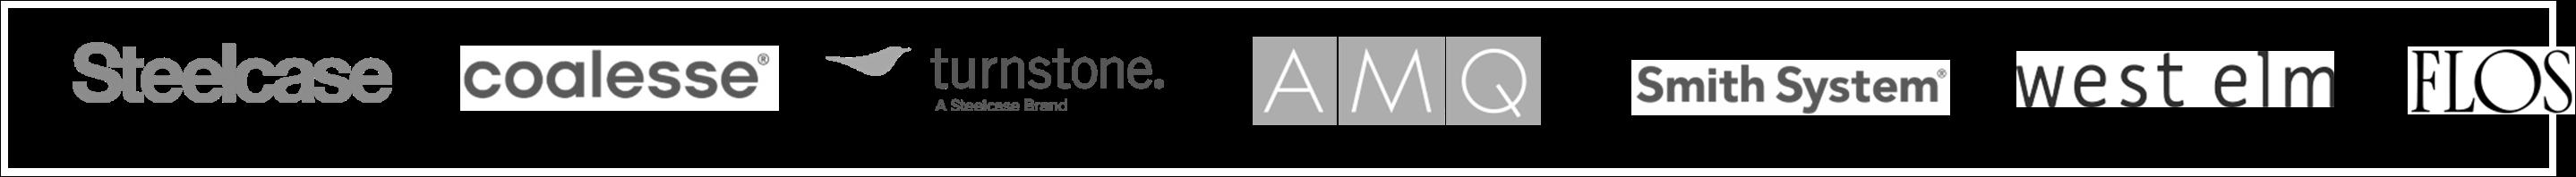 Steelcase brands banner partial